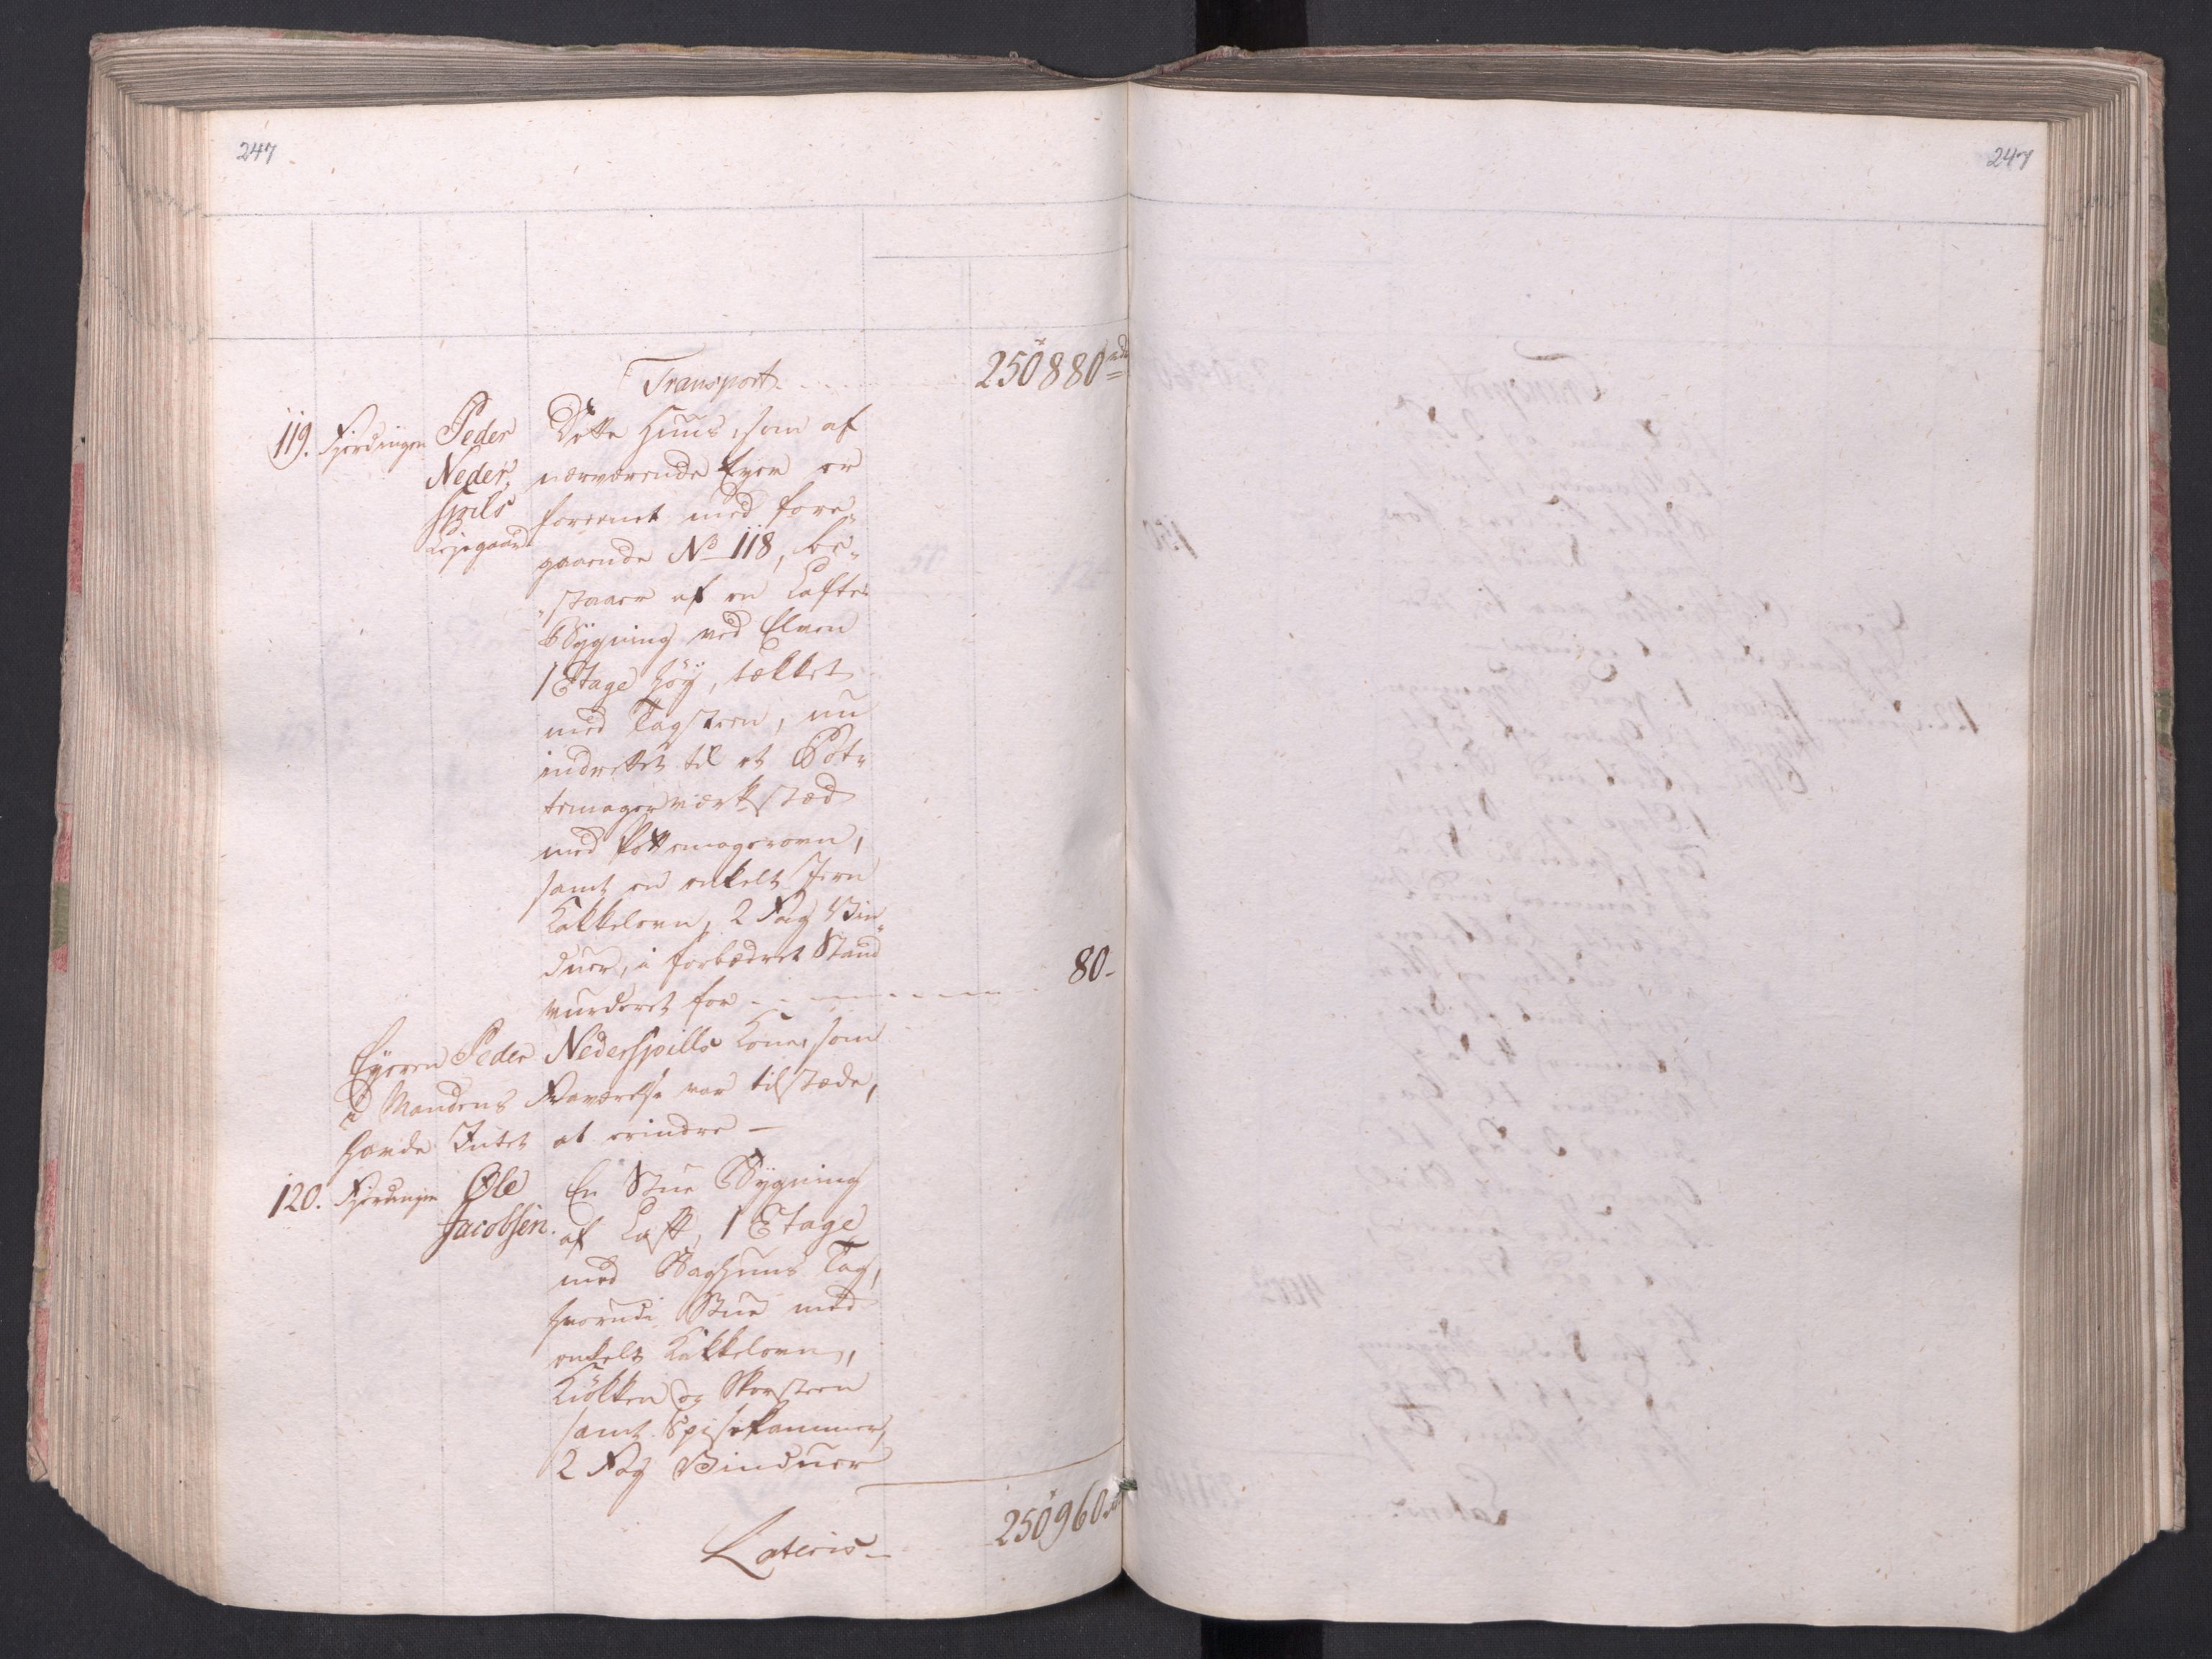 SAO, Kristiania stiftamt, I/Ia/L0015: Branntakster, 1797, s. 247